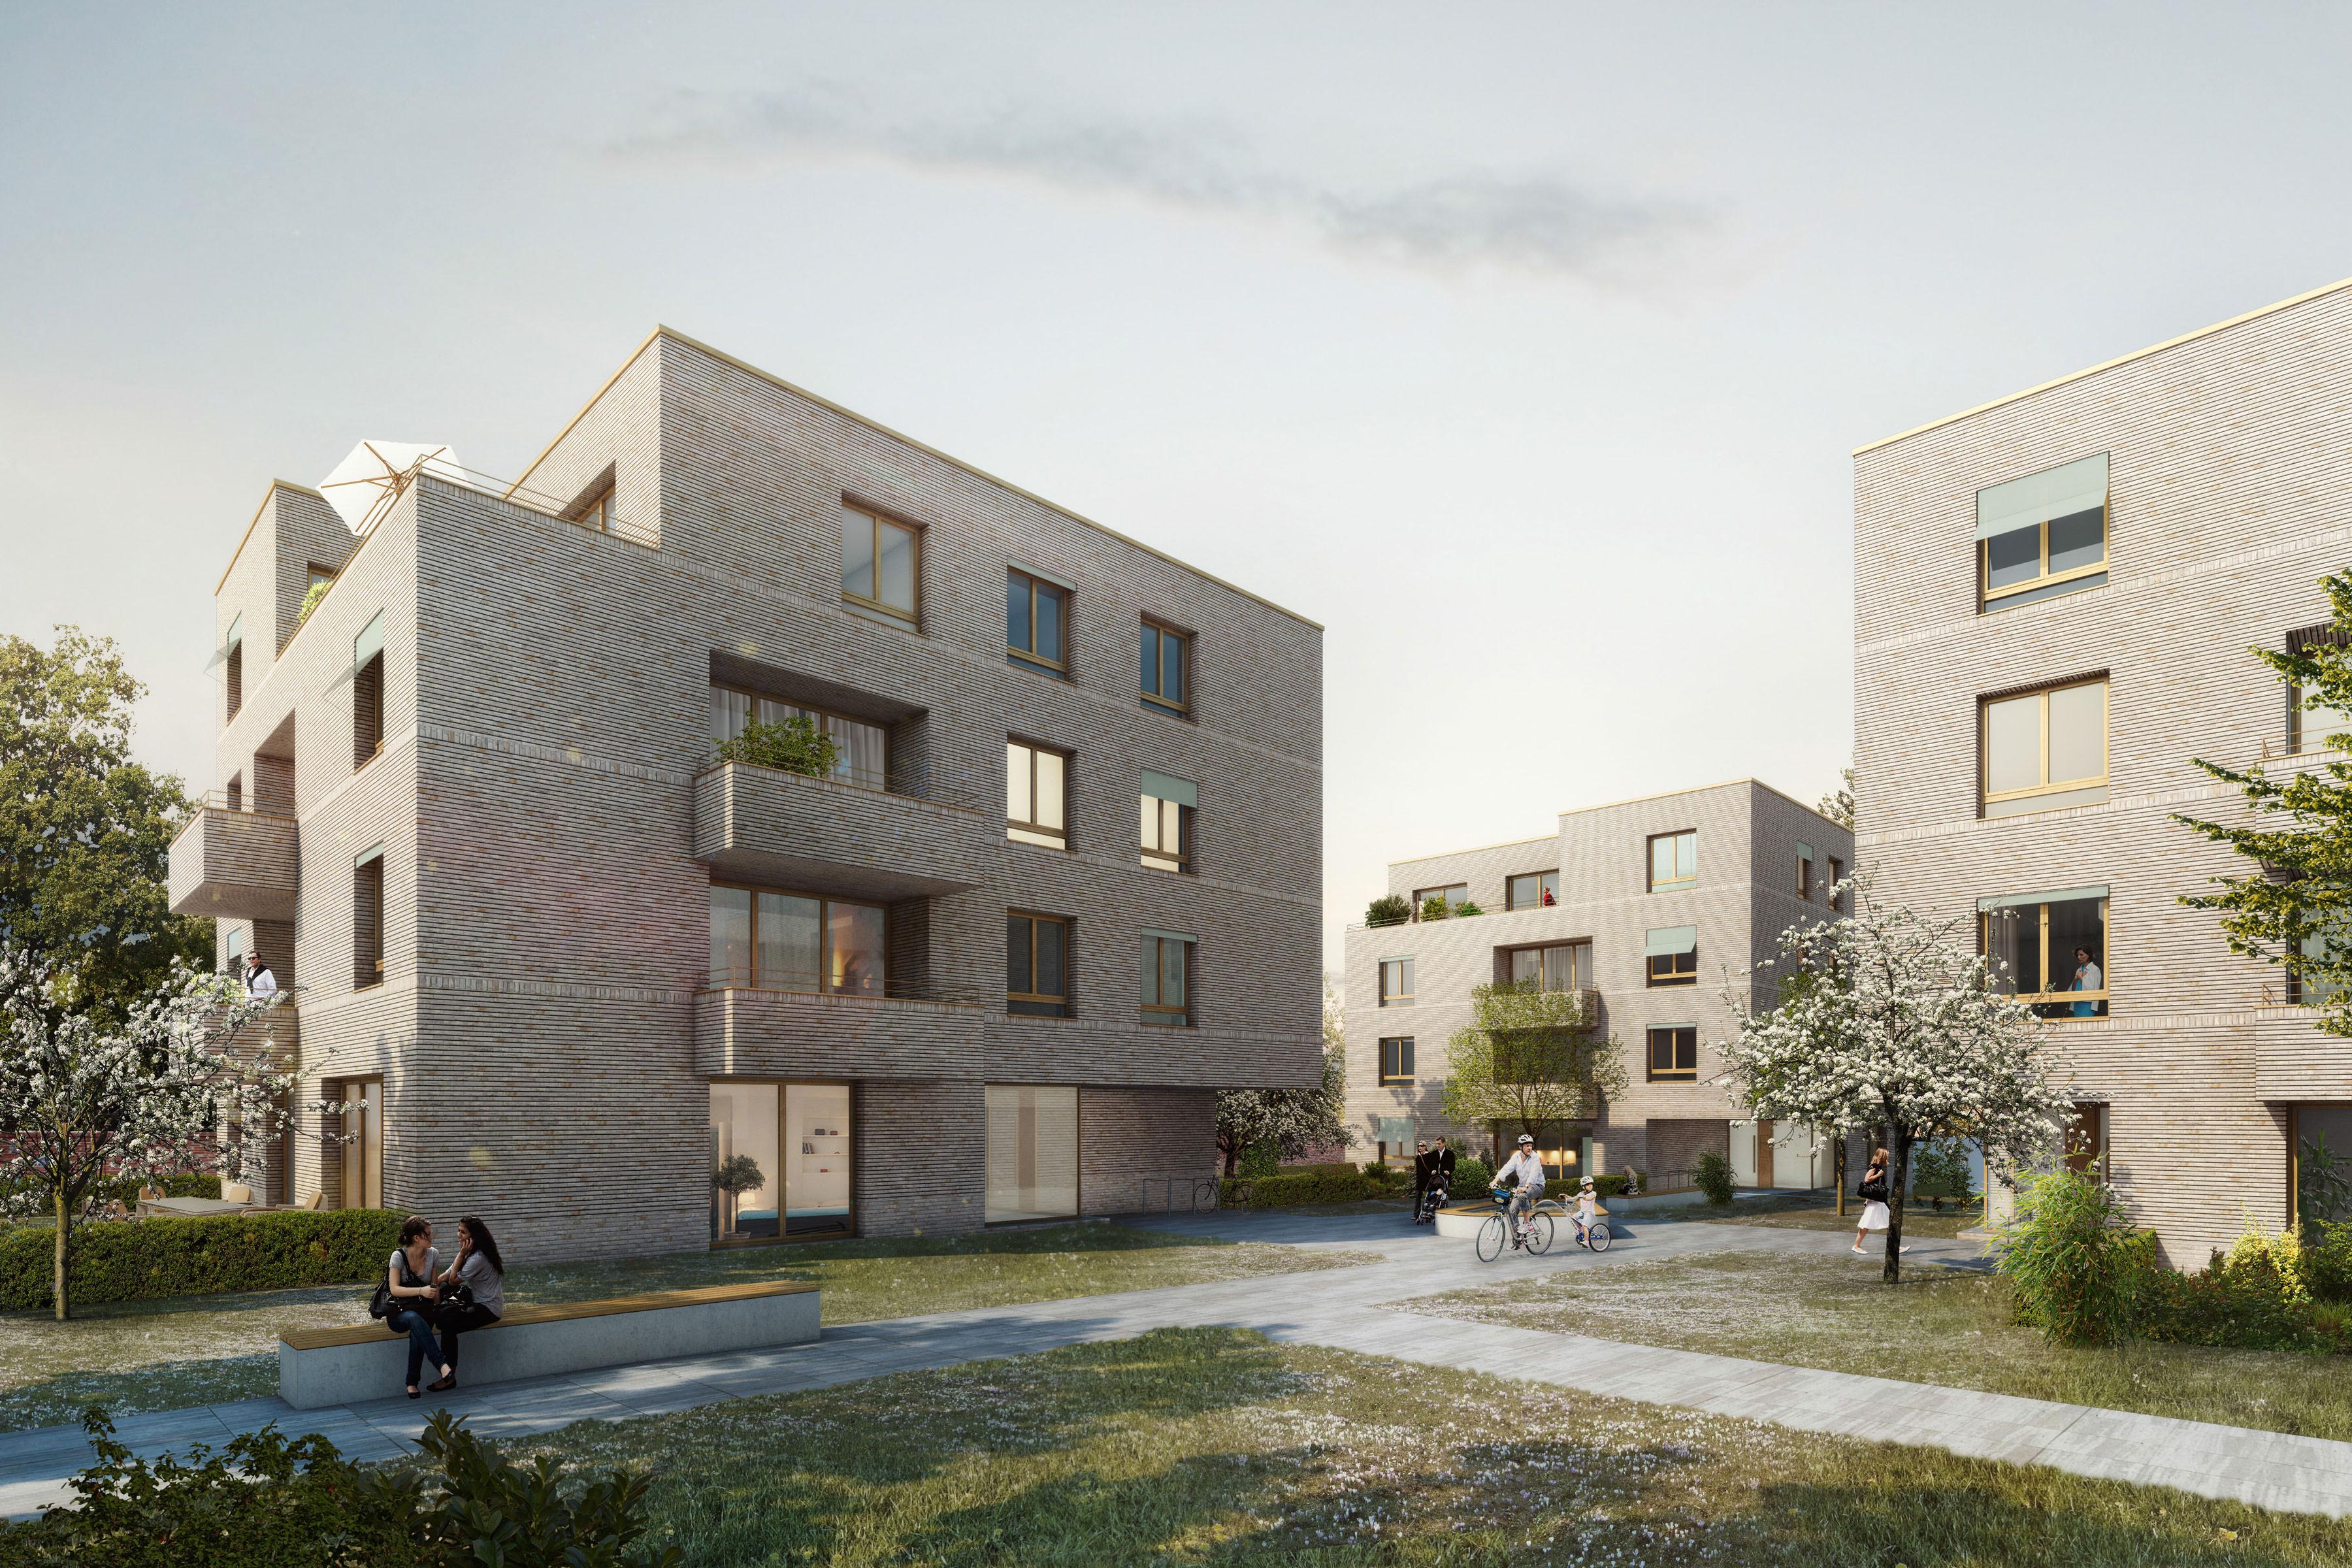 Projekt Grabowstraße